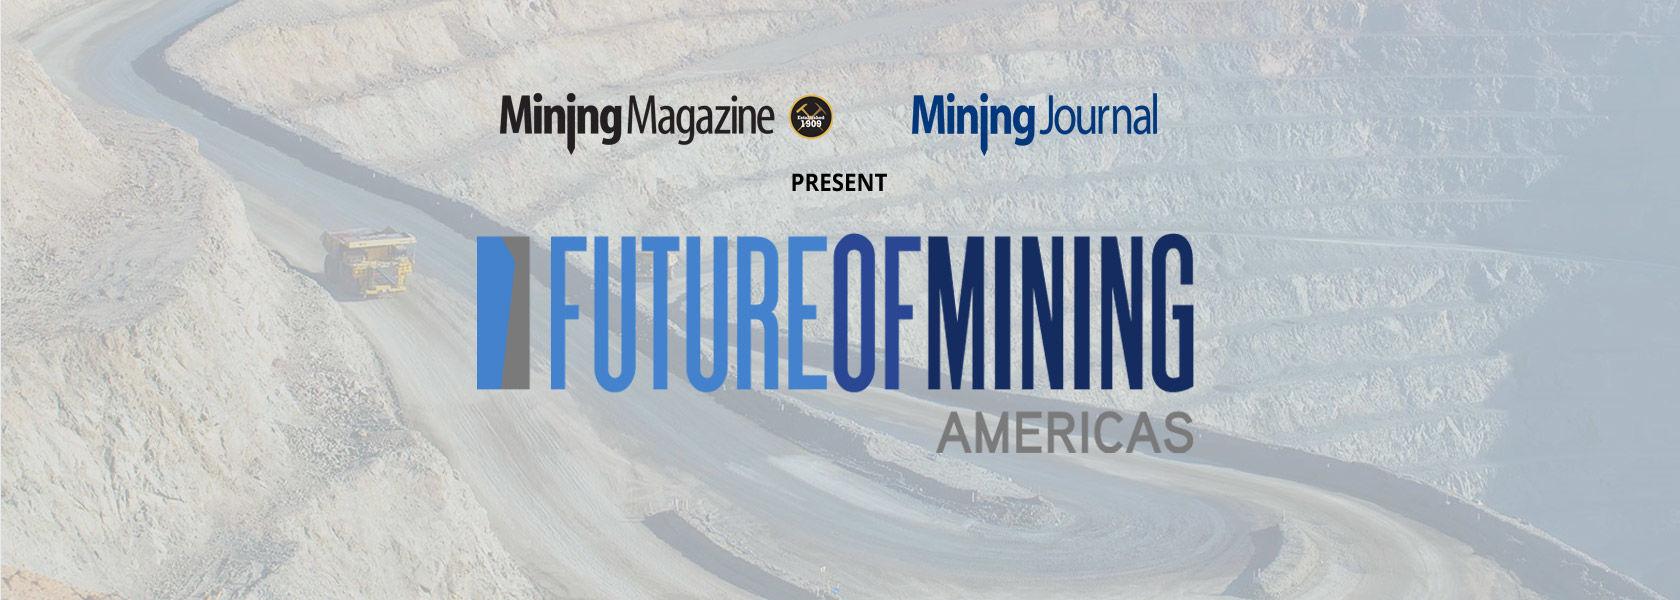 Future of Mining Americas 2019 - Mining Magazine